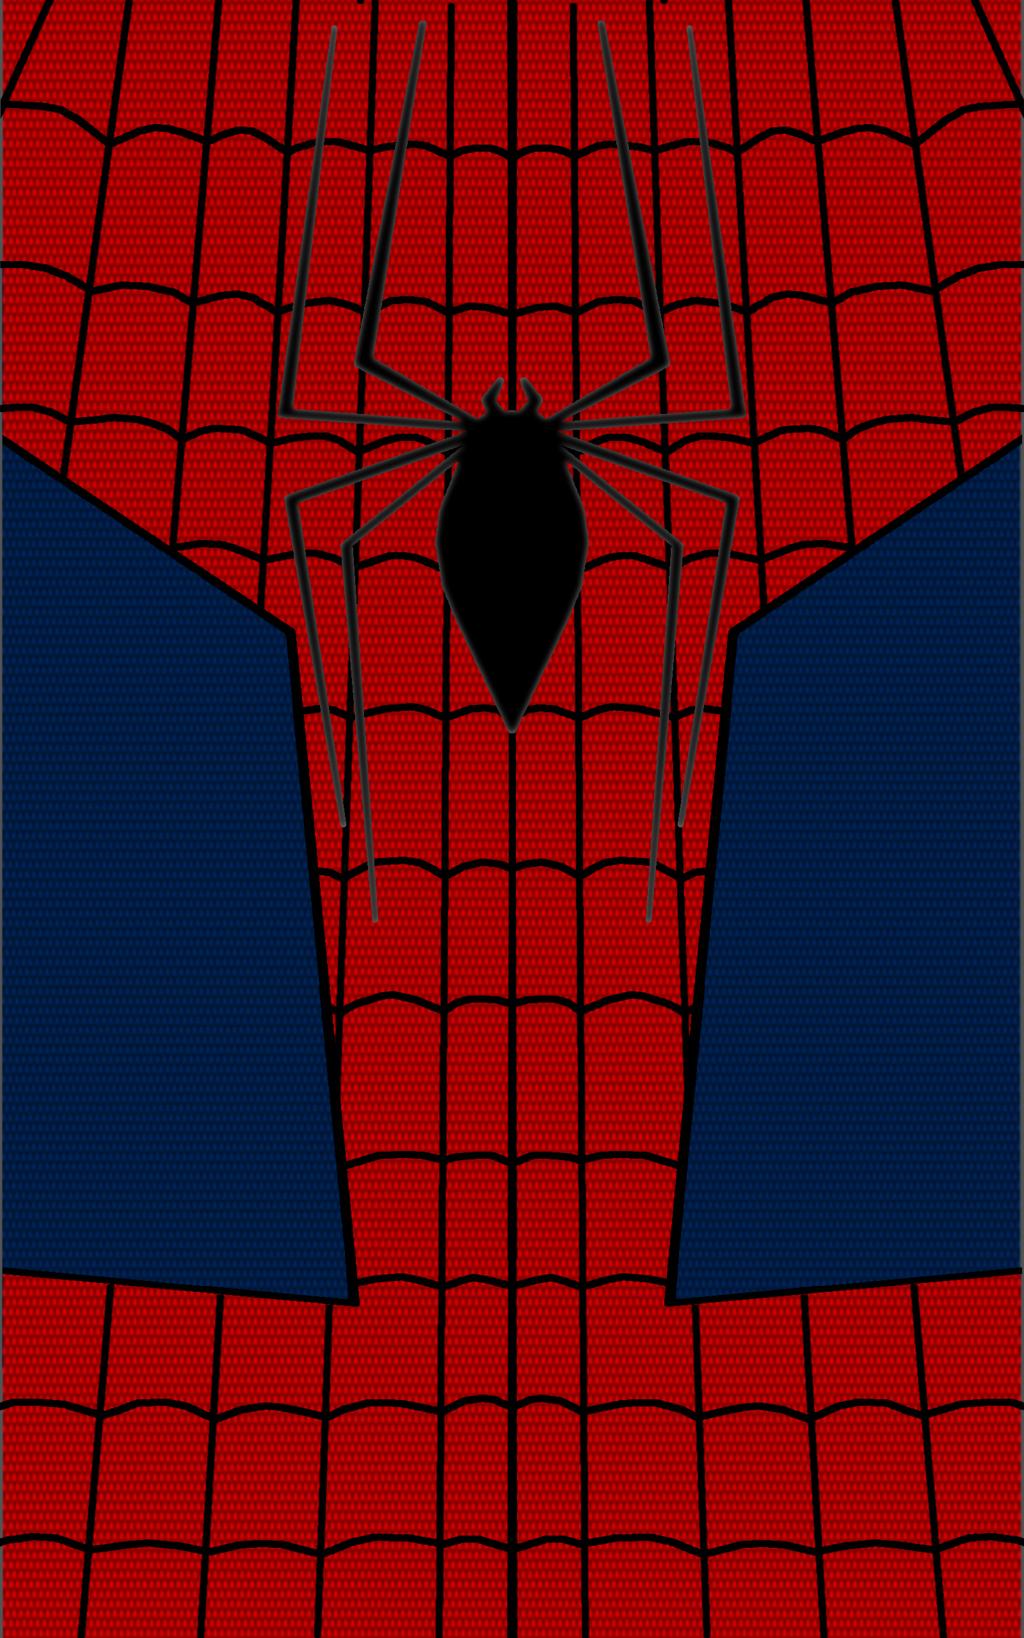 Spiderman Web Template New Spiderman Web Stencil